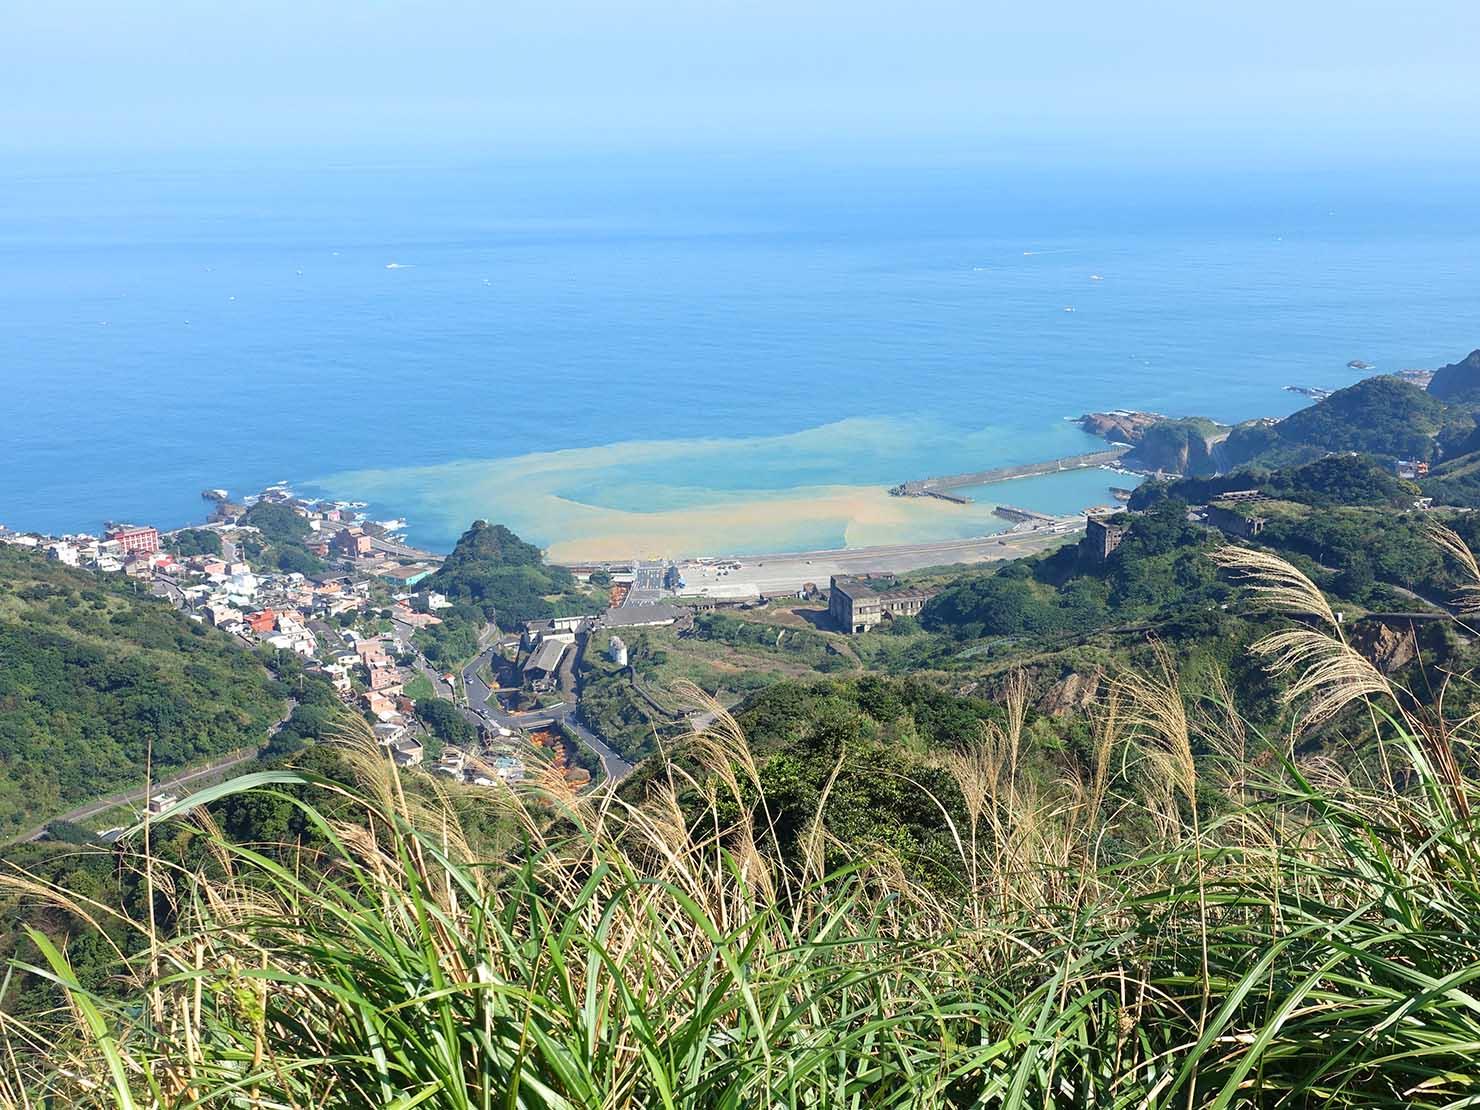 台北・金瓜石天間車遺址から望む陰陽海